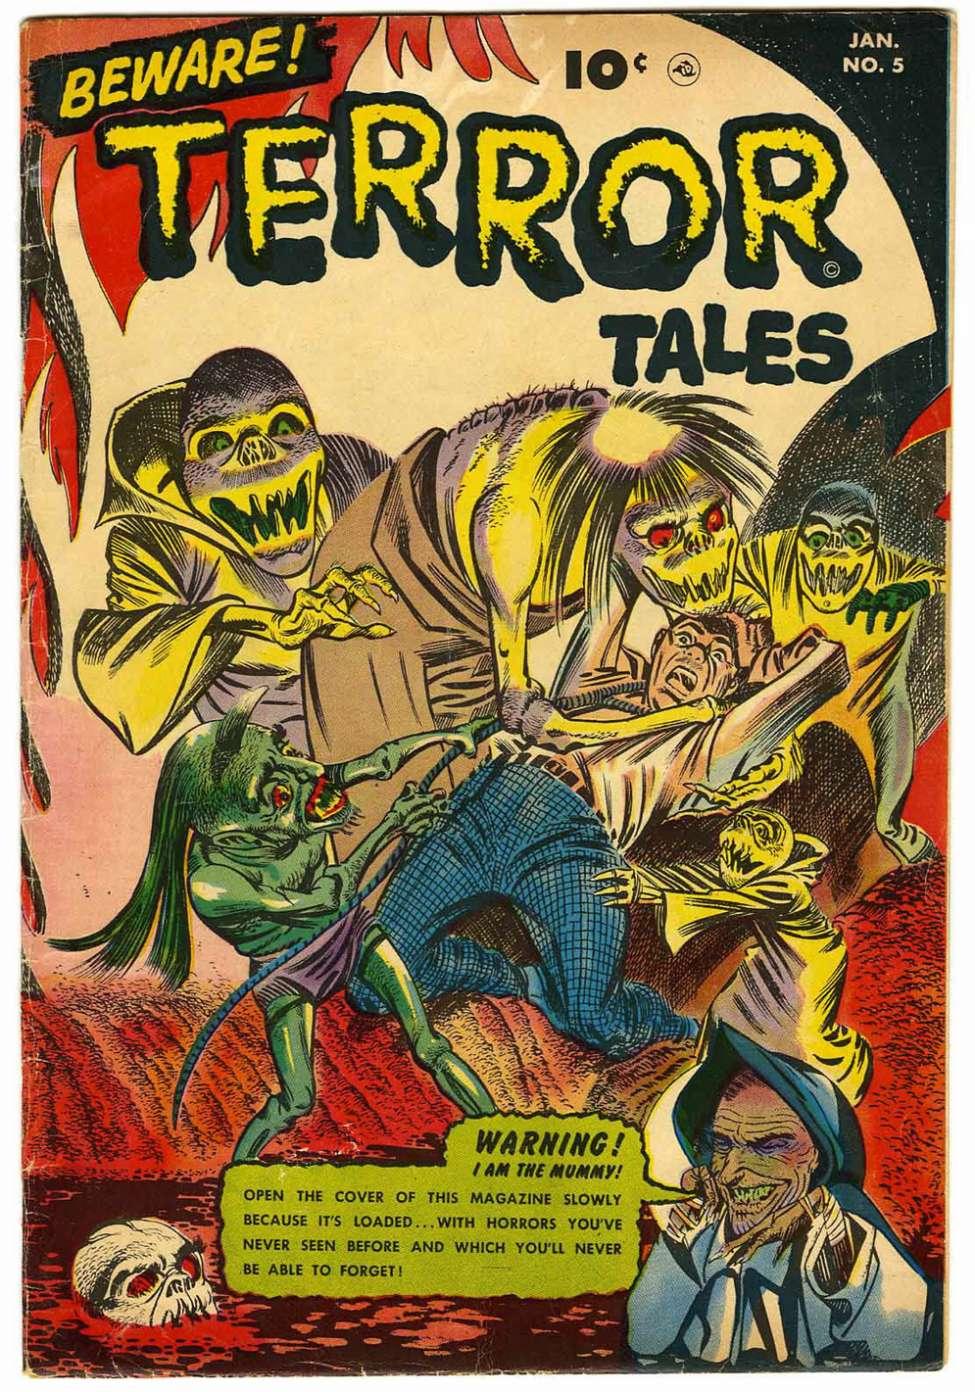 Comic Book Cover For Beware! Terror Tales #5